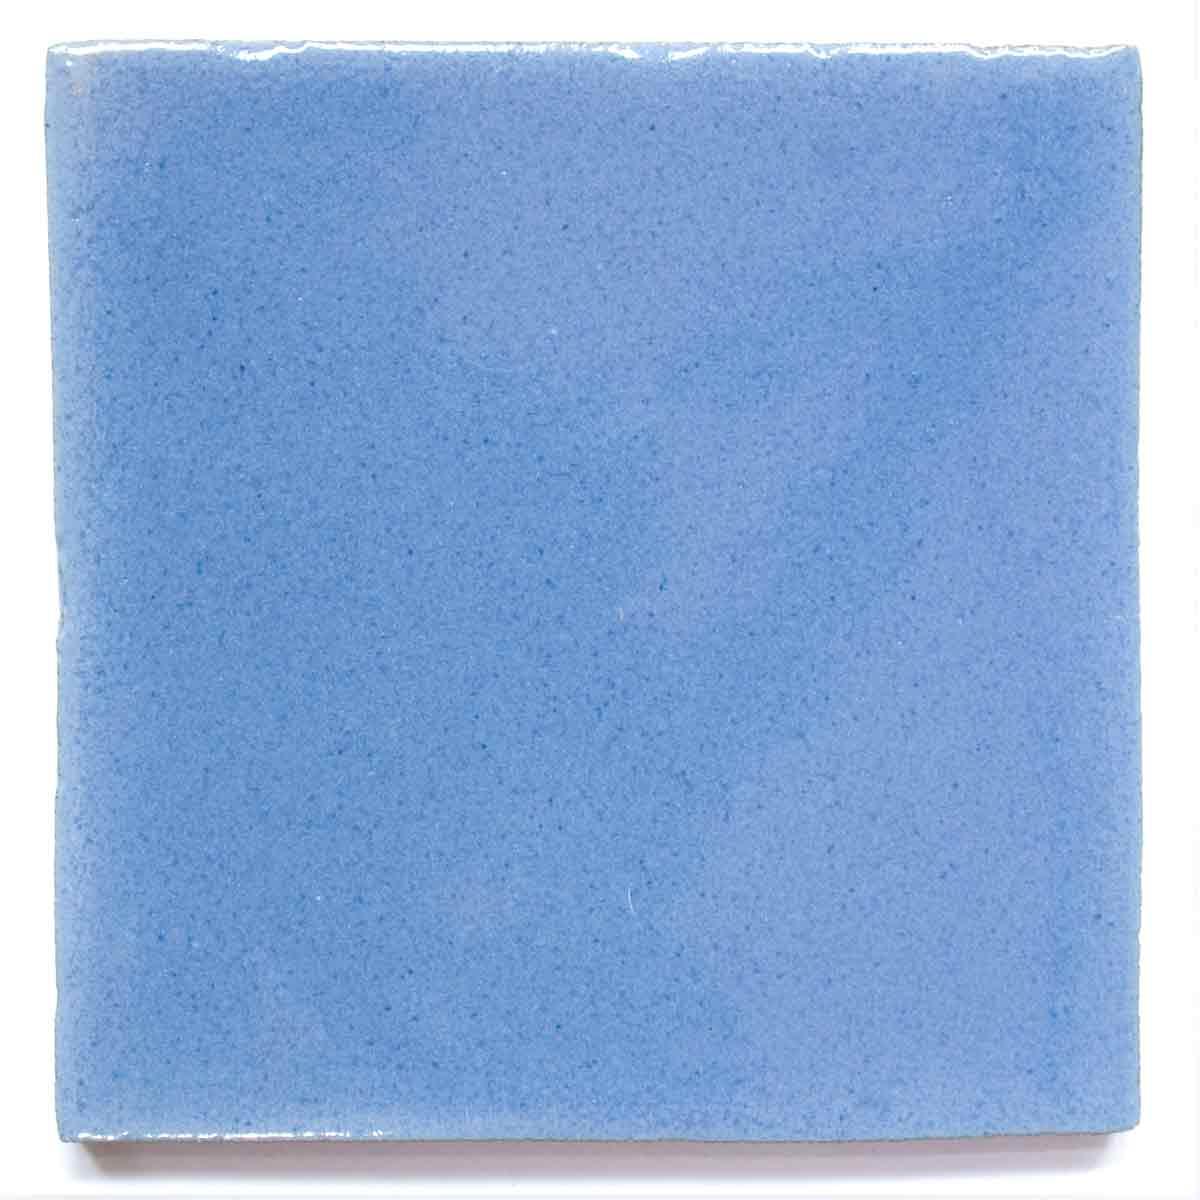 claro blue hand made tiles.